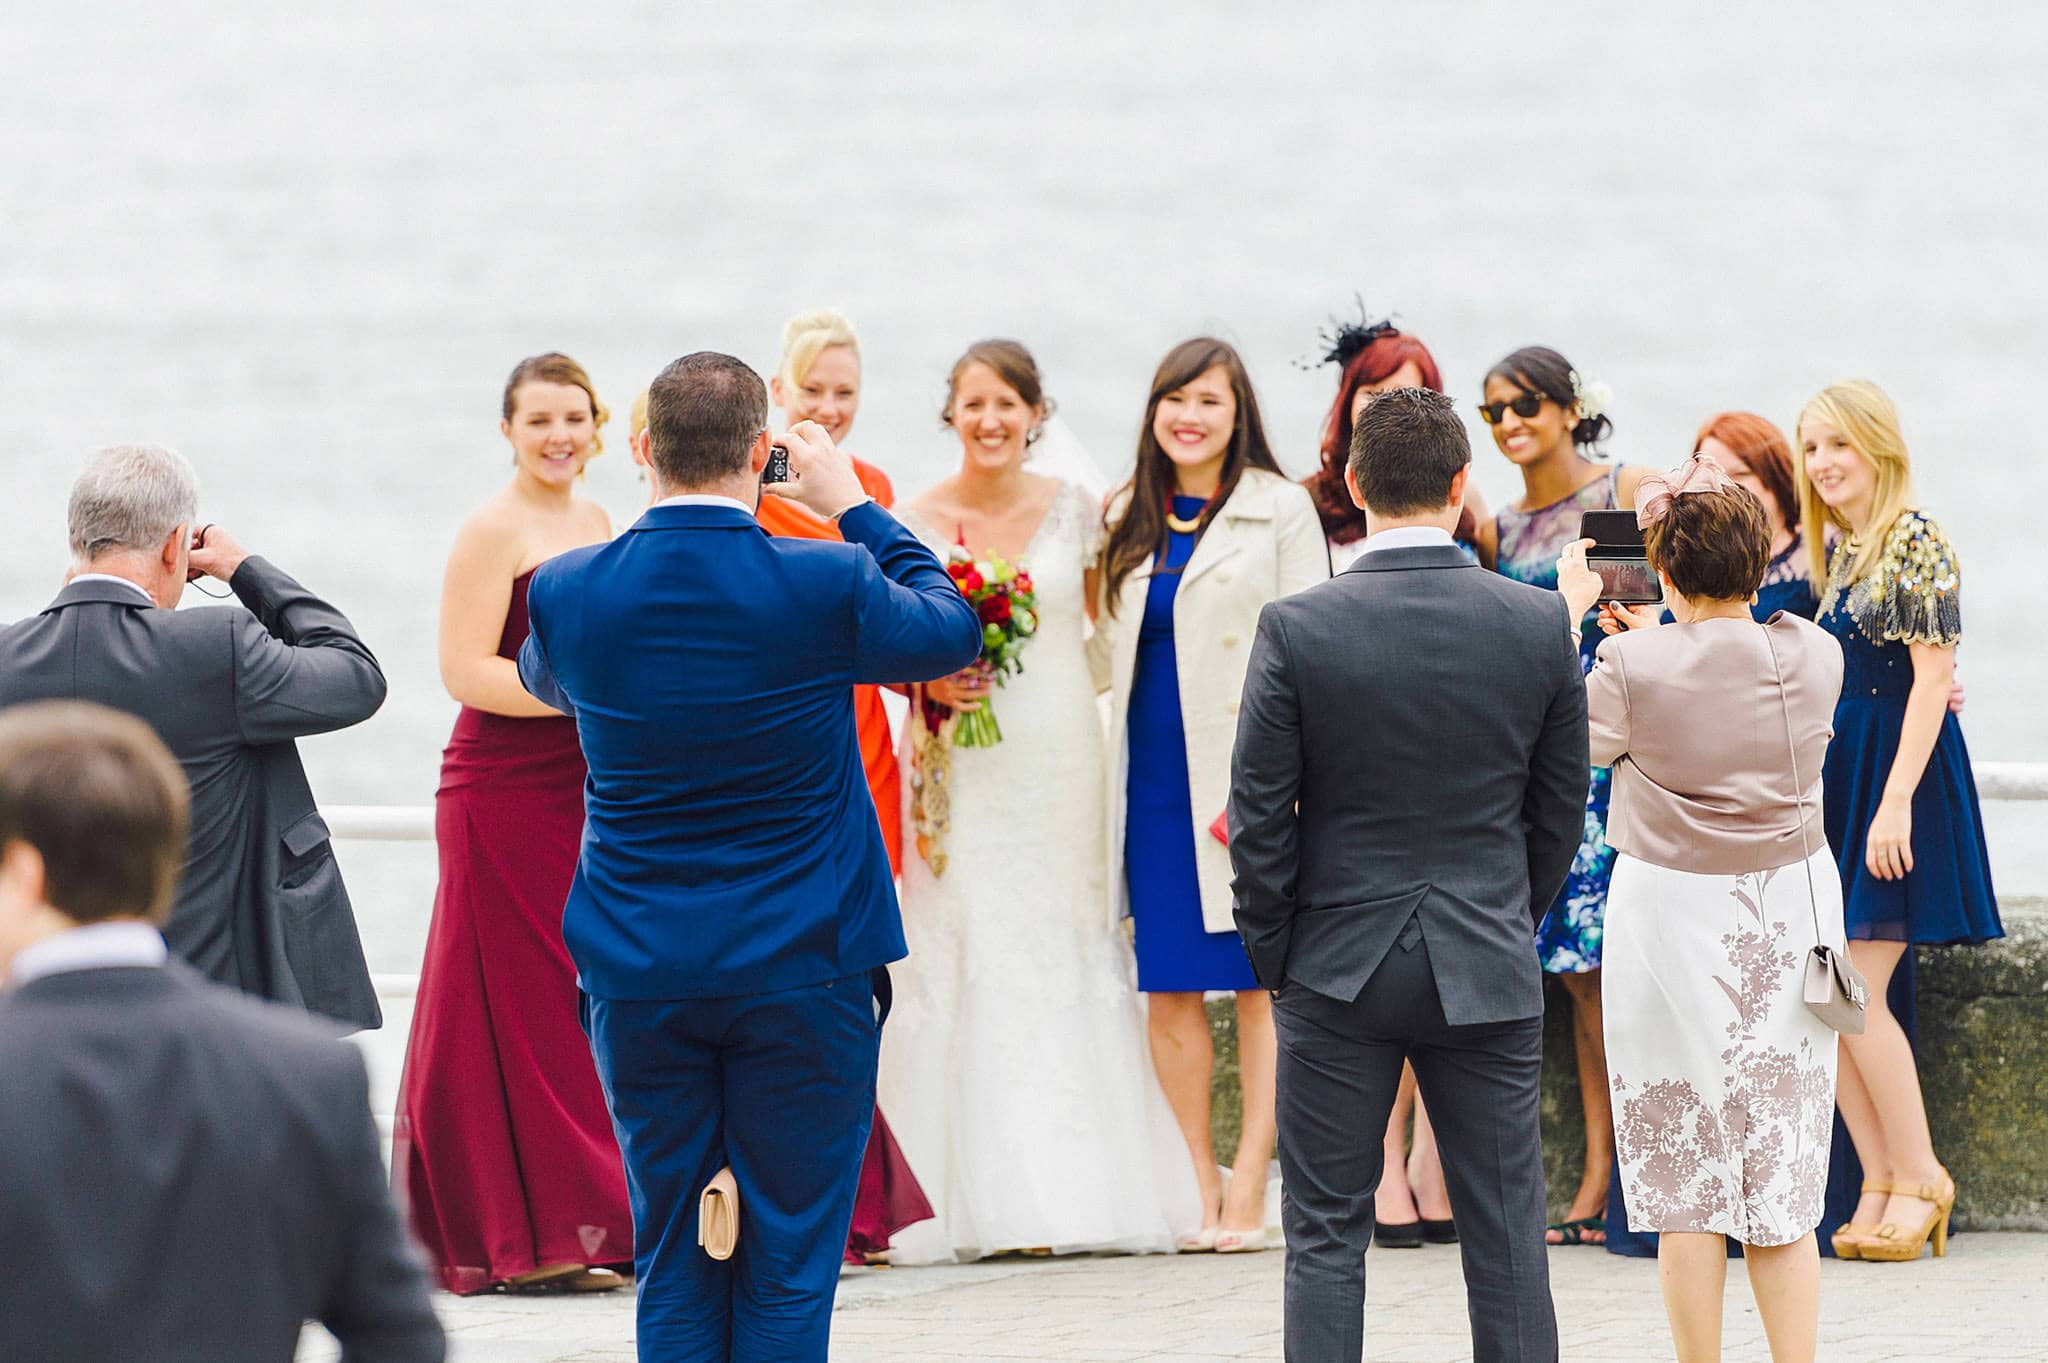 wedding-photographer-aberystwyth-wales (106)